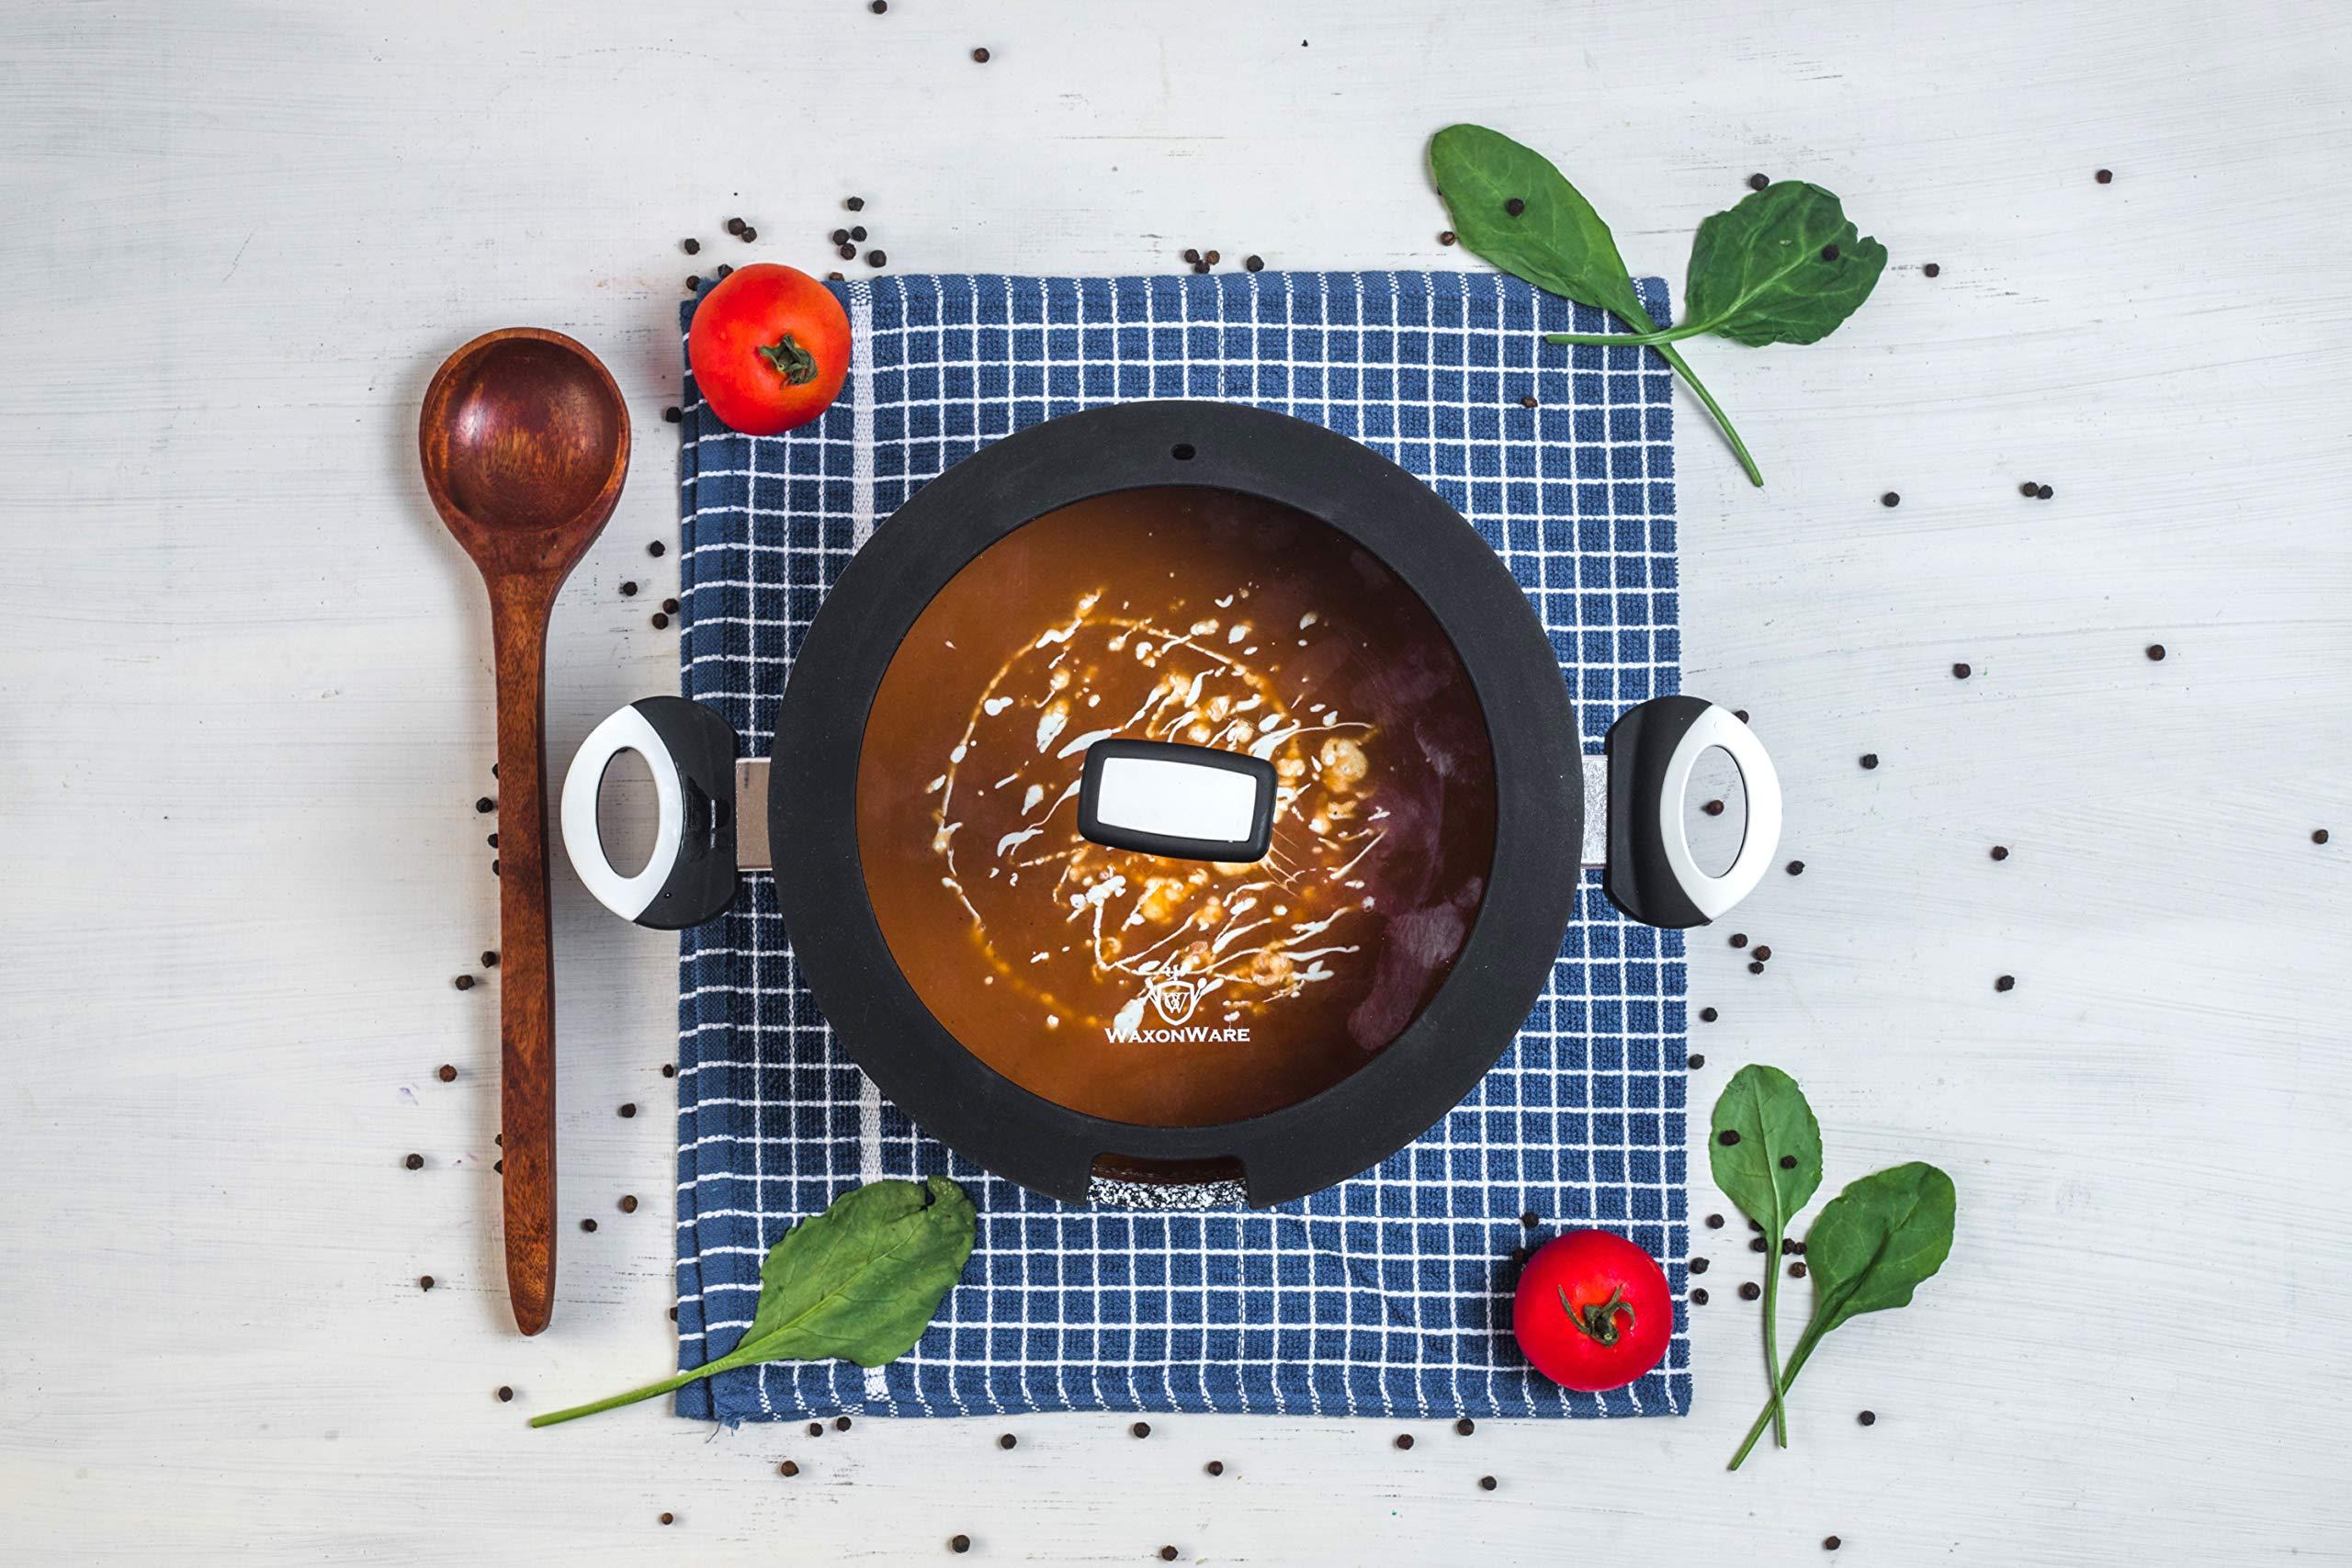 WaxonWare 5.25 Quart Ceramic Nonstick Dutch Oven Casserole Stockpot, Anti-Warp Non Toxic PTFE APEO PFOA Free Nonstick Pot With Lid, Induction Compatible, Dishwasher Safe Dutch Oven (STONETEC Series) by WaxonWare (Image #7)